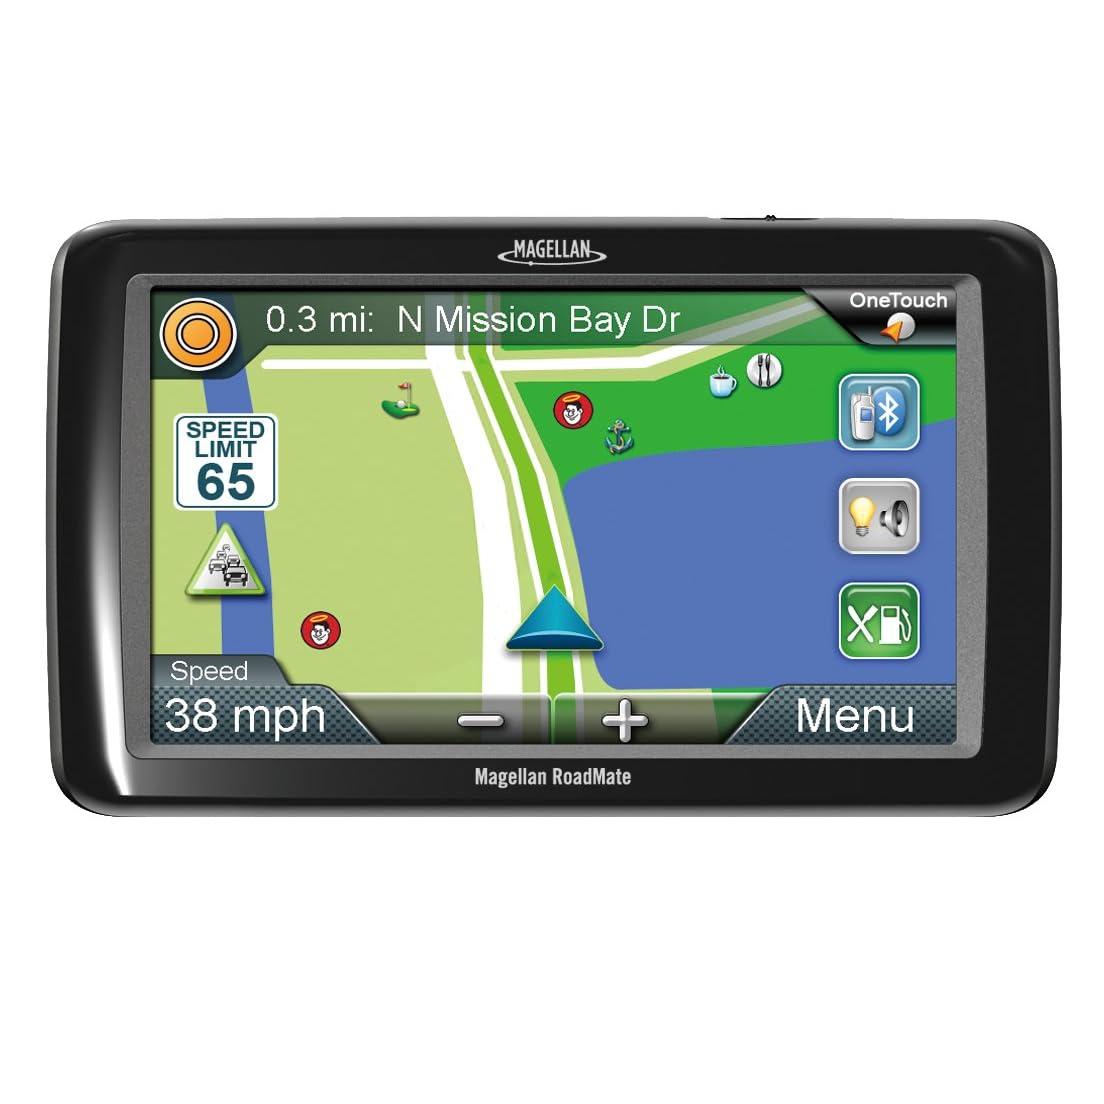 Magellan RoadMate Pro 9165T - 7-Inch GPS Navigator for RVers